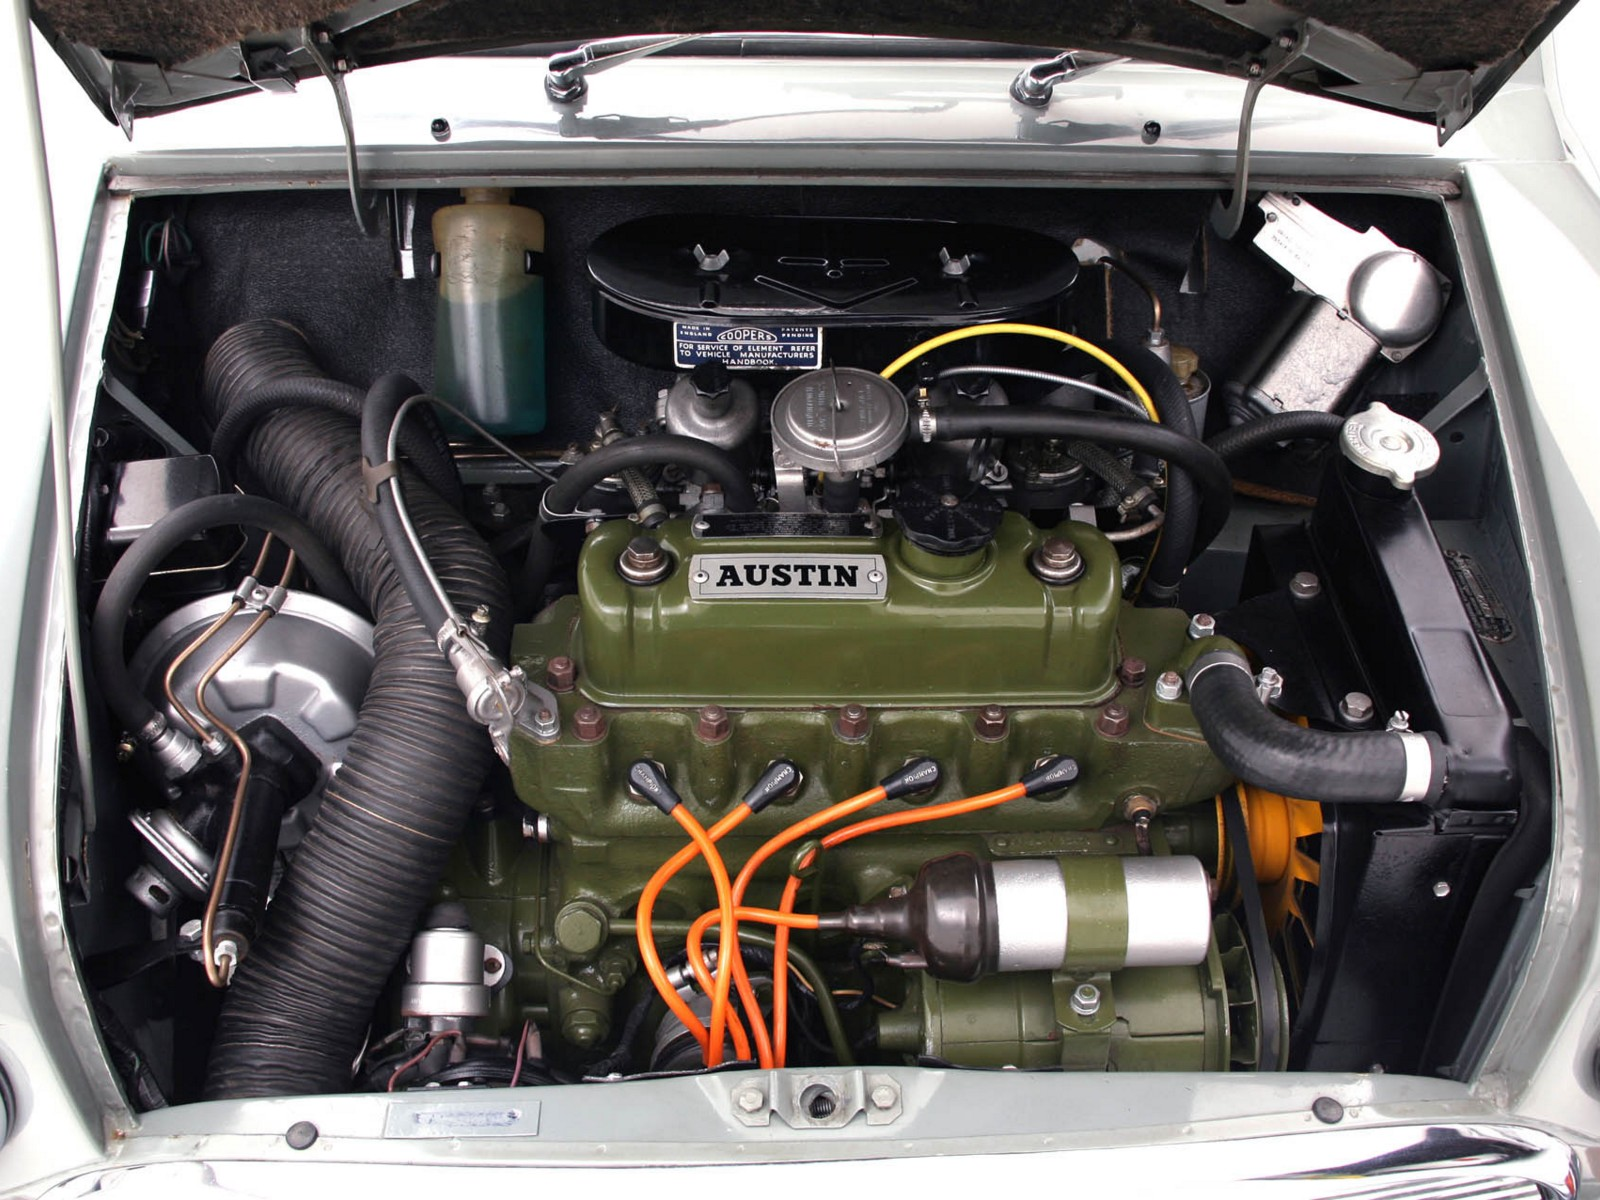 1964 austin mini cooper s rally ado15 race racing classic cooper s engine g wallpaper. Black Bedroom Furniture Sets. Home Design Ideas